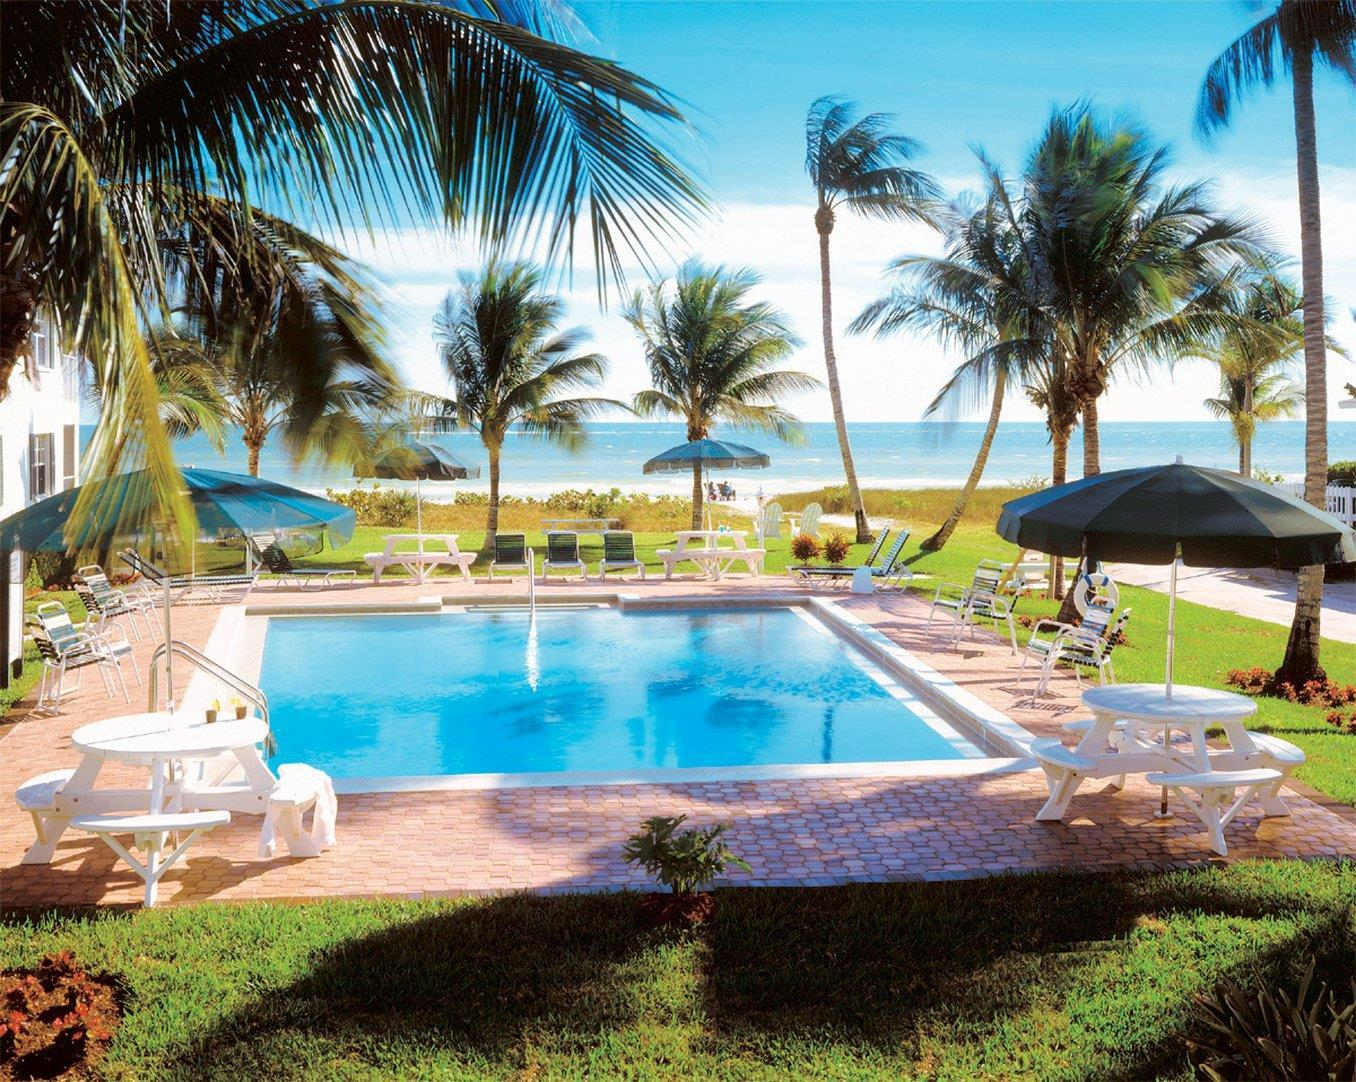 Sanibel's Seaside Inn Sanibel Island, FL